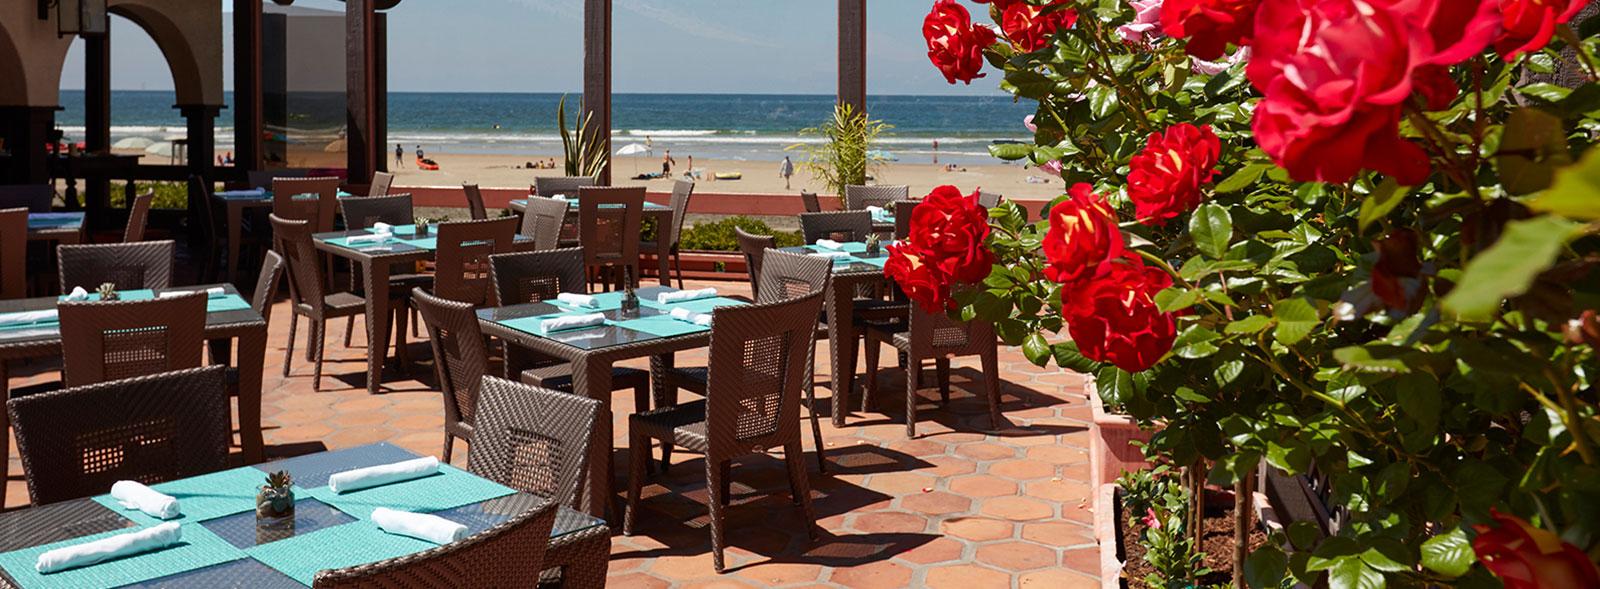 Dining at La Jolla Shores Hotel